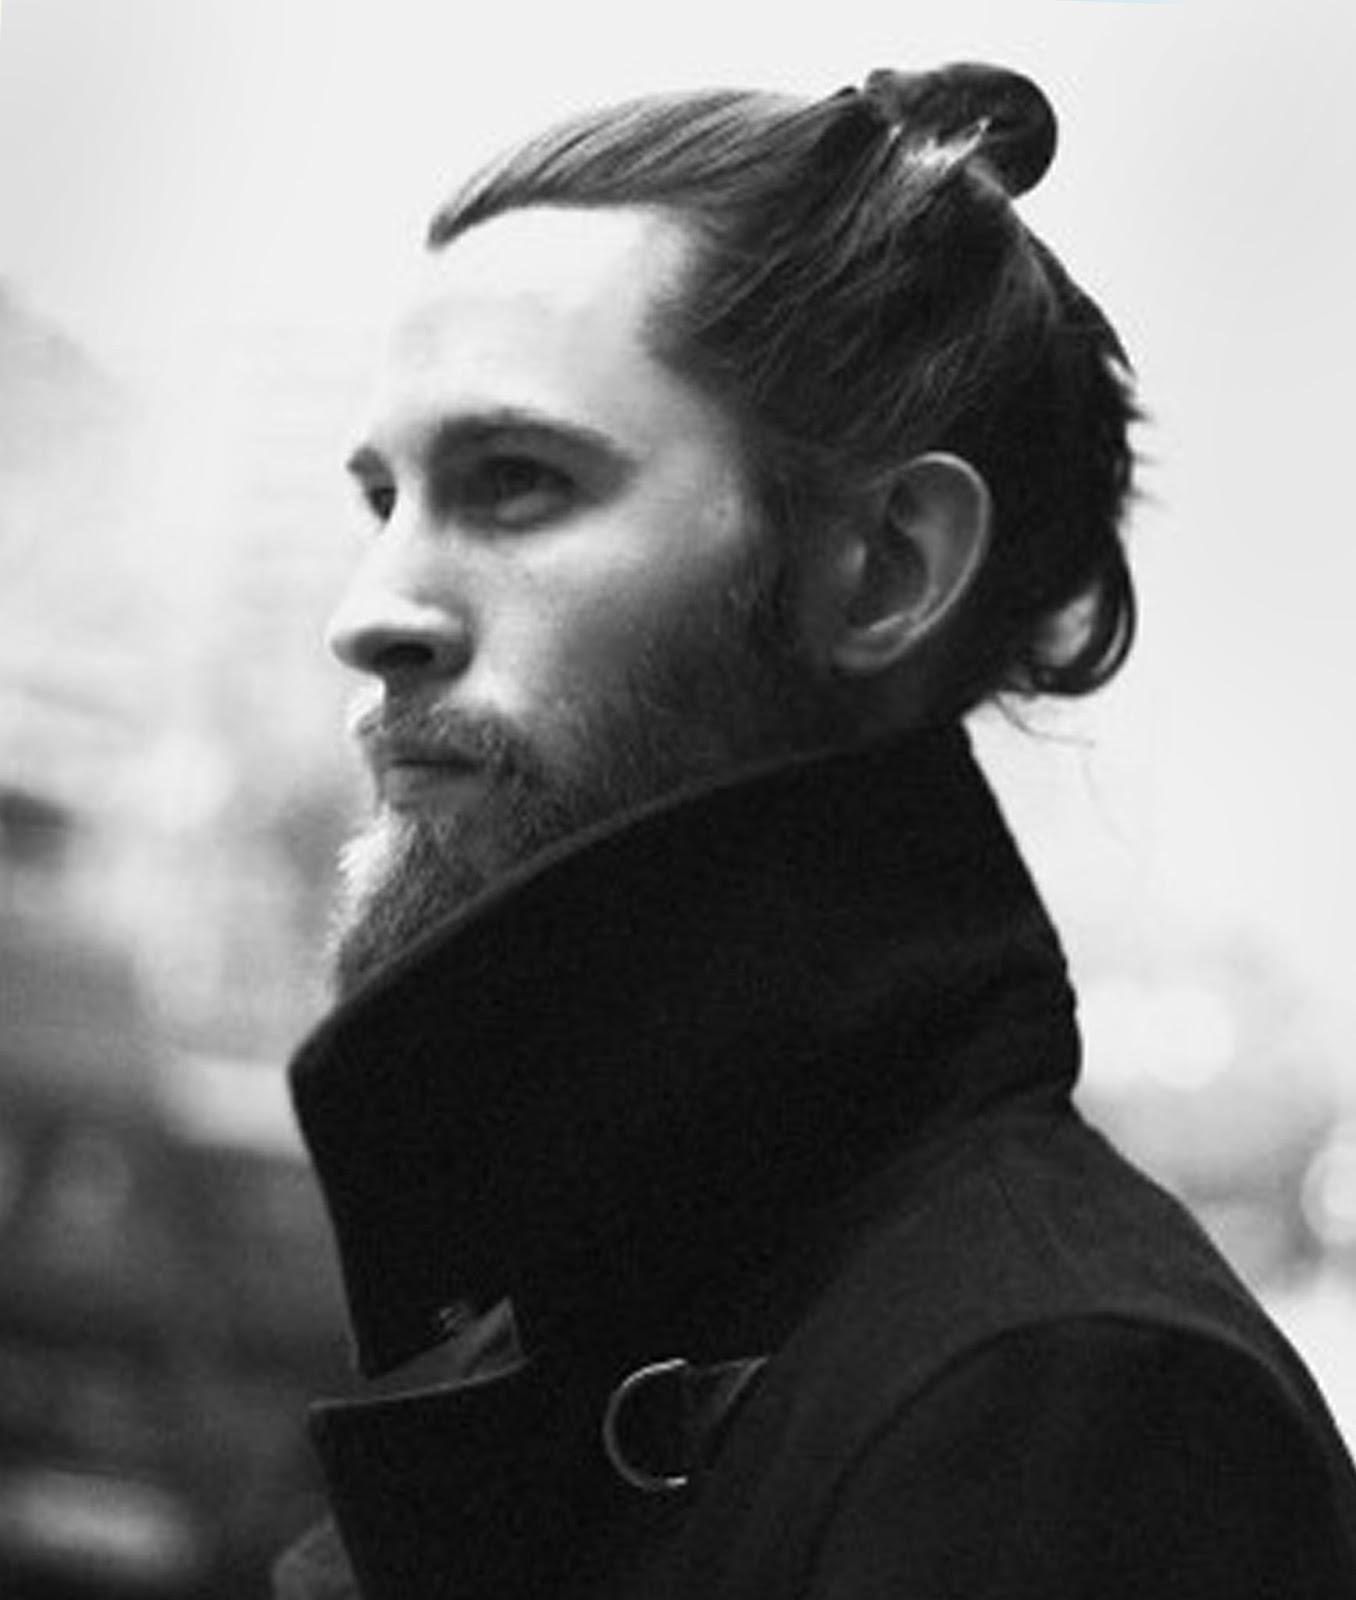 Samurai Bun Hairstyle Hairstyles Spot